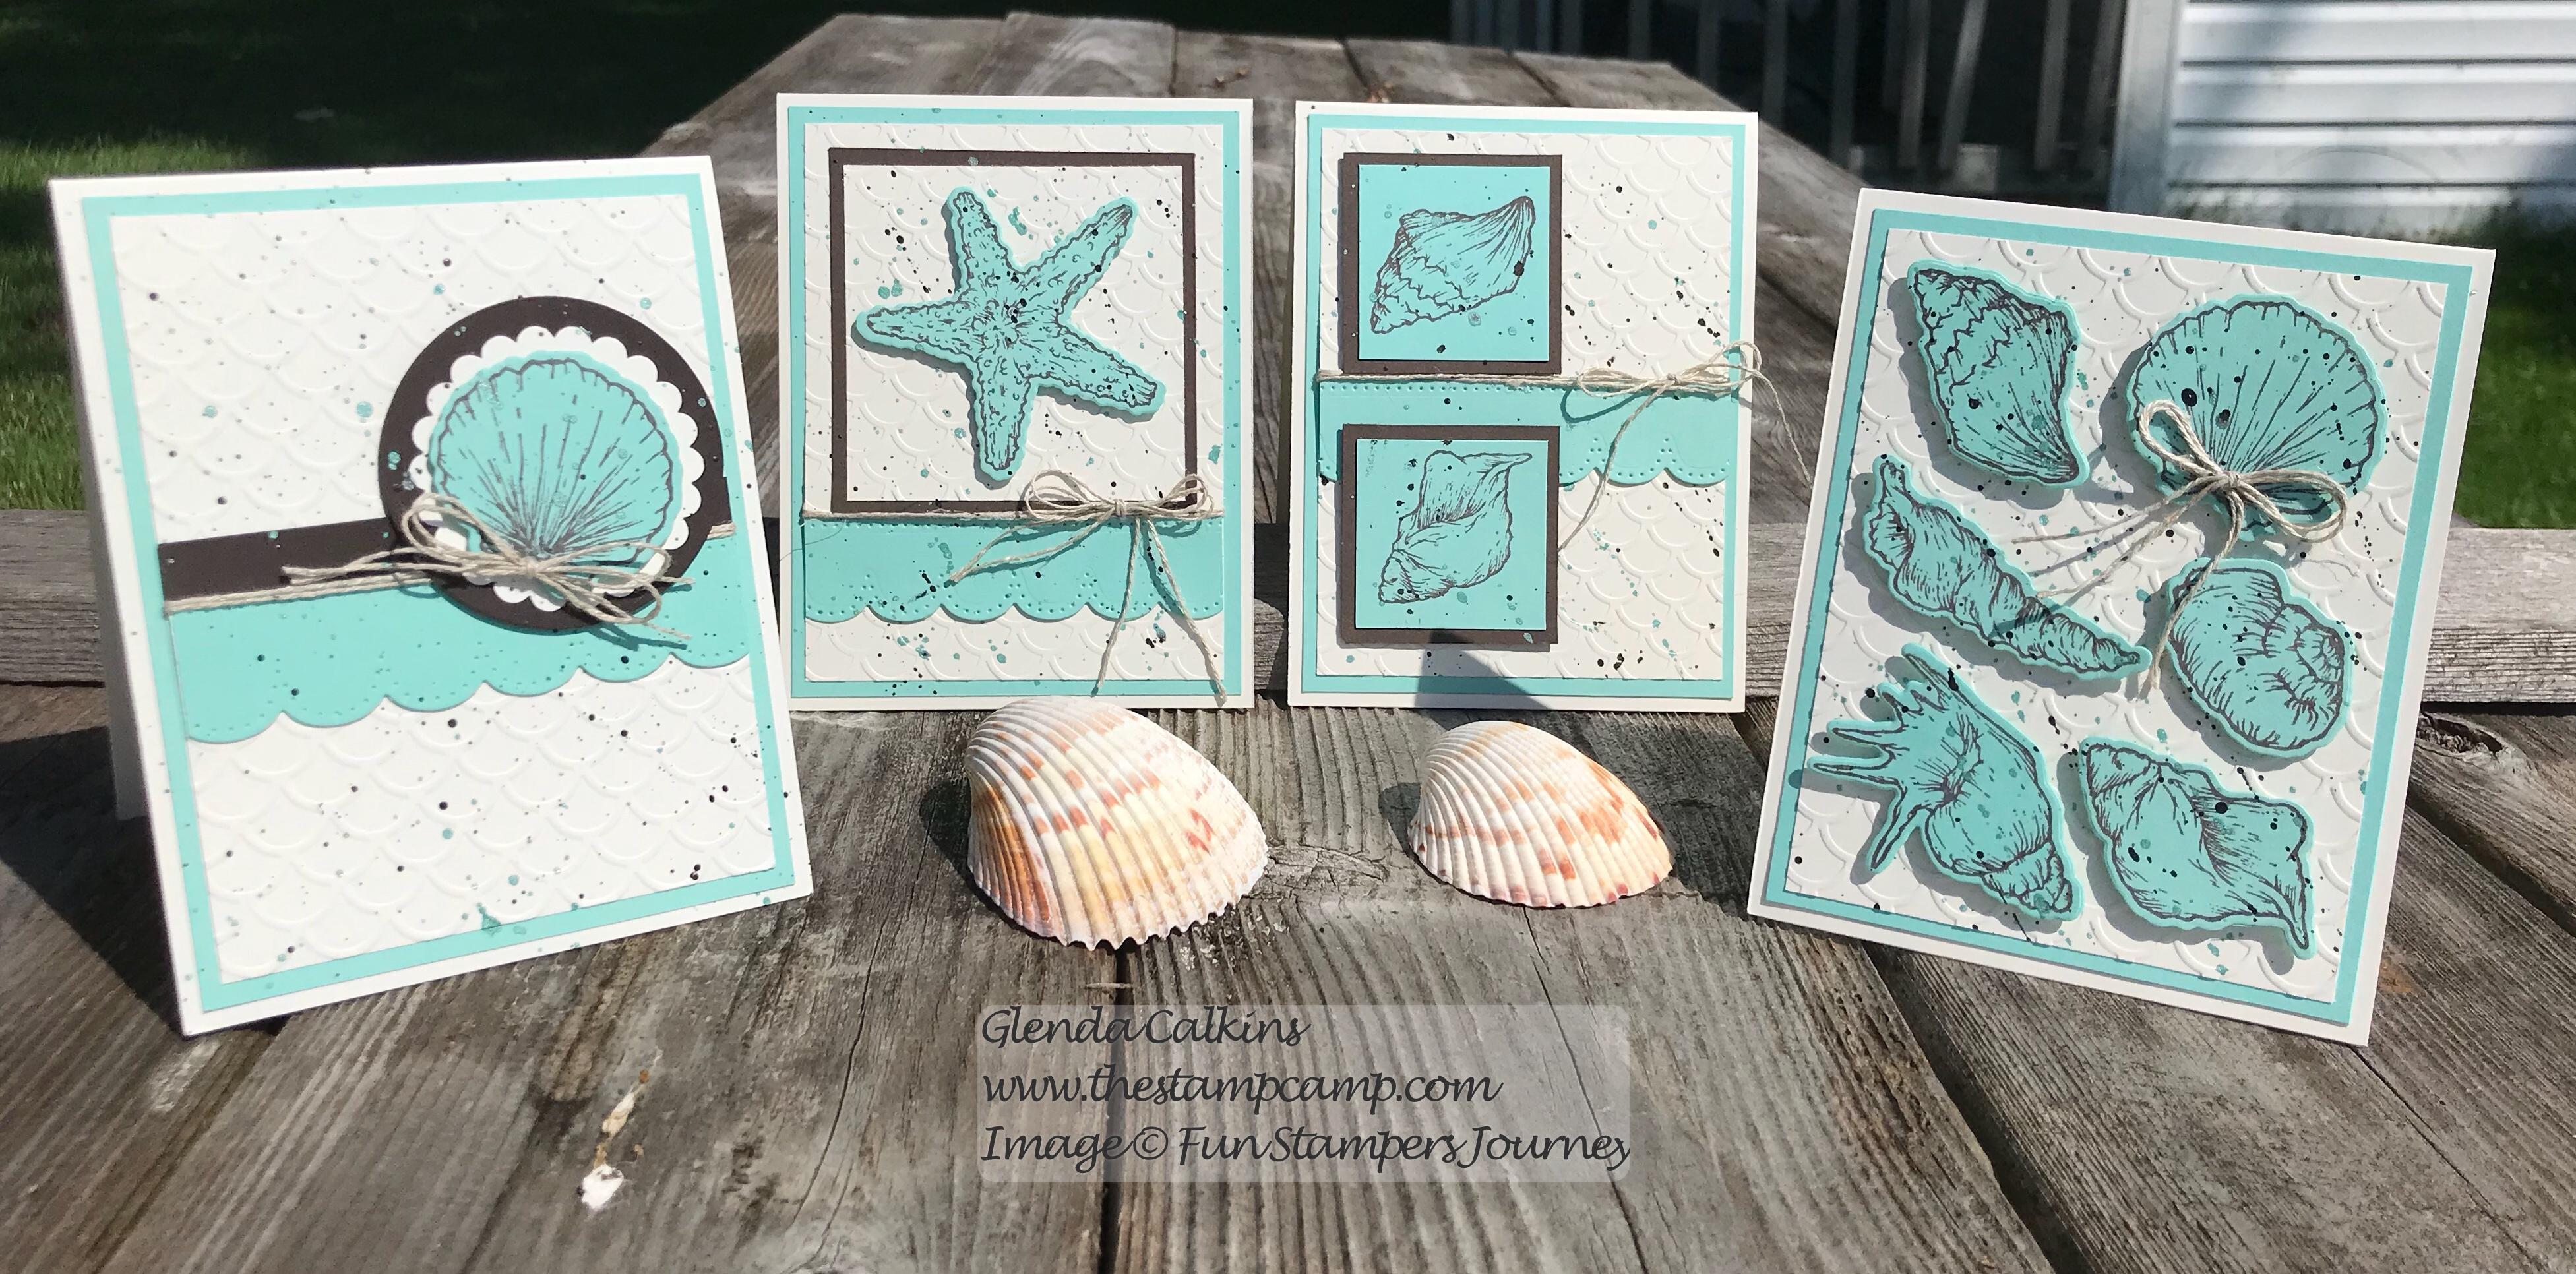 Beach Treasures Bundle, Fun Stampers Journey, glendasblog, the stamp camp